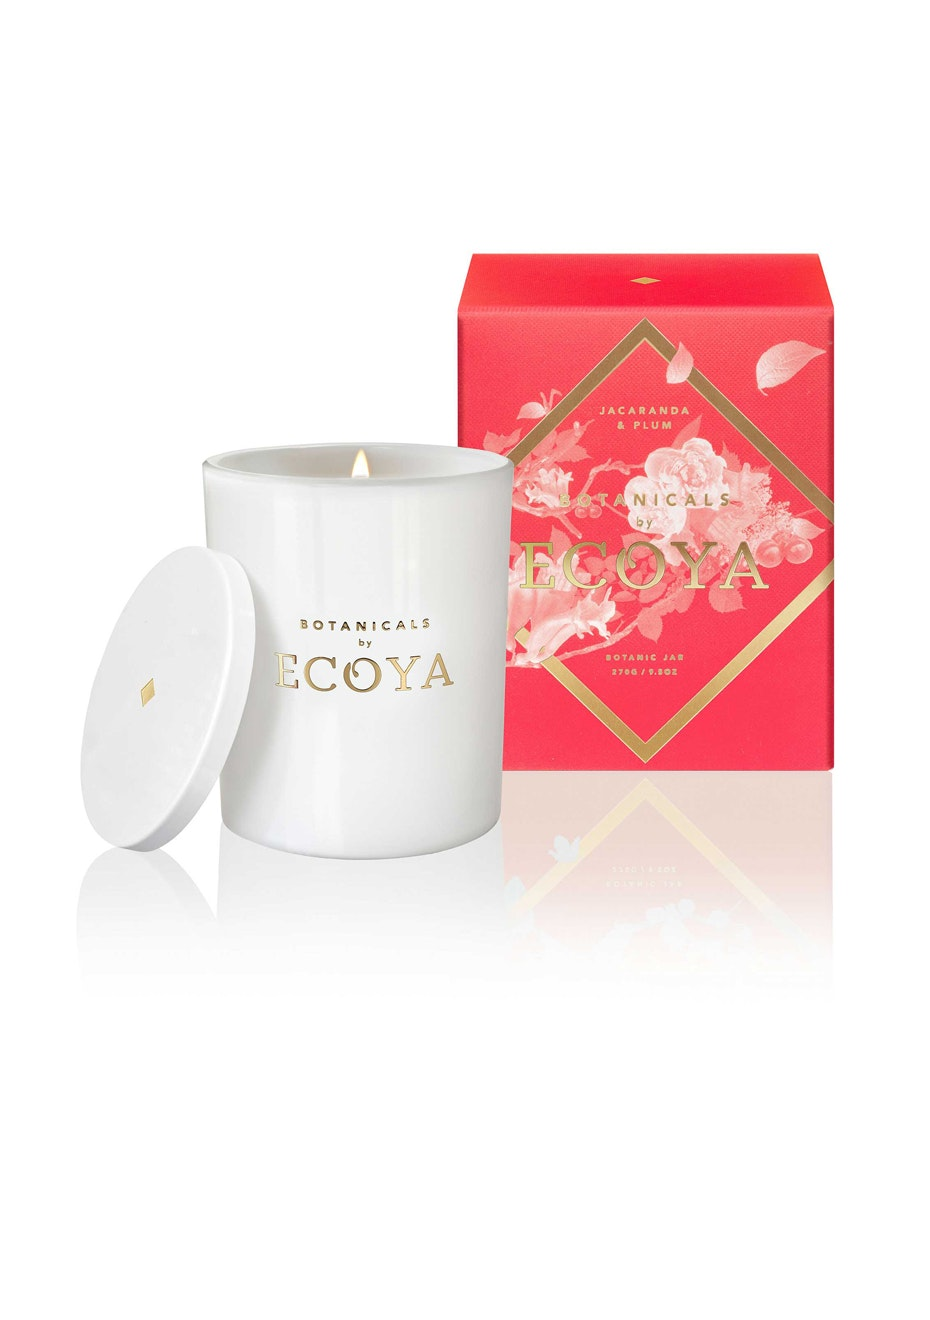 Ecoya - Botanic Jar - Jacaranda & Plum